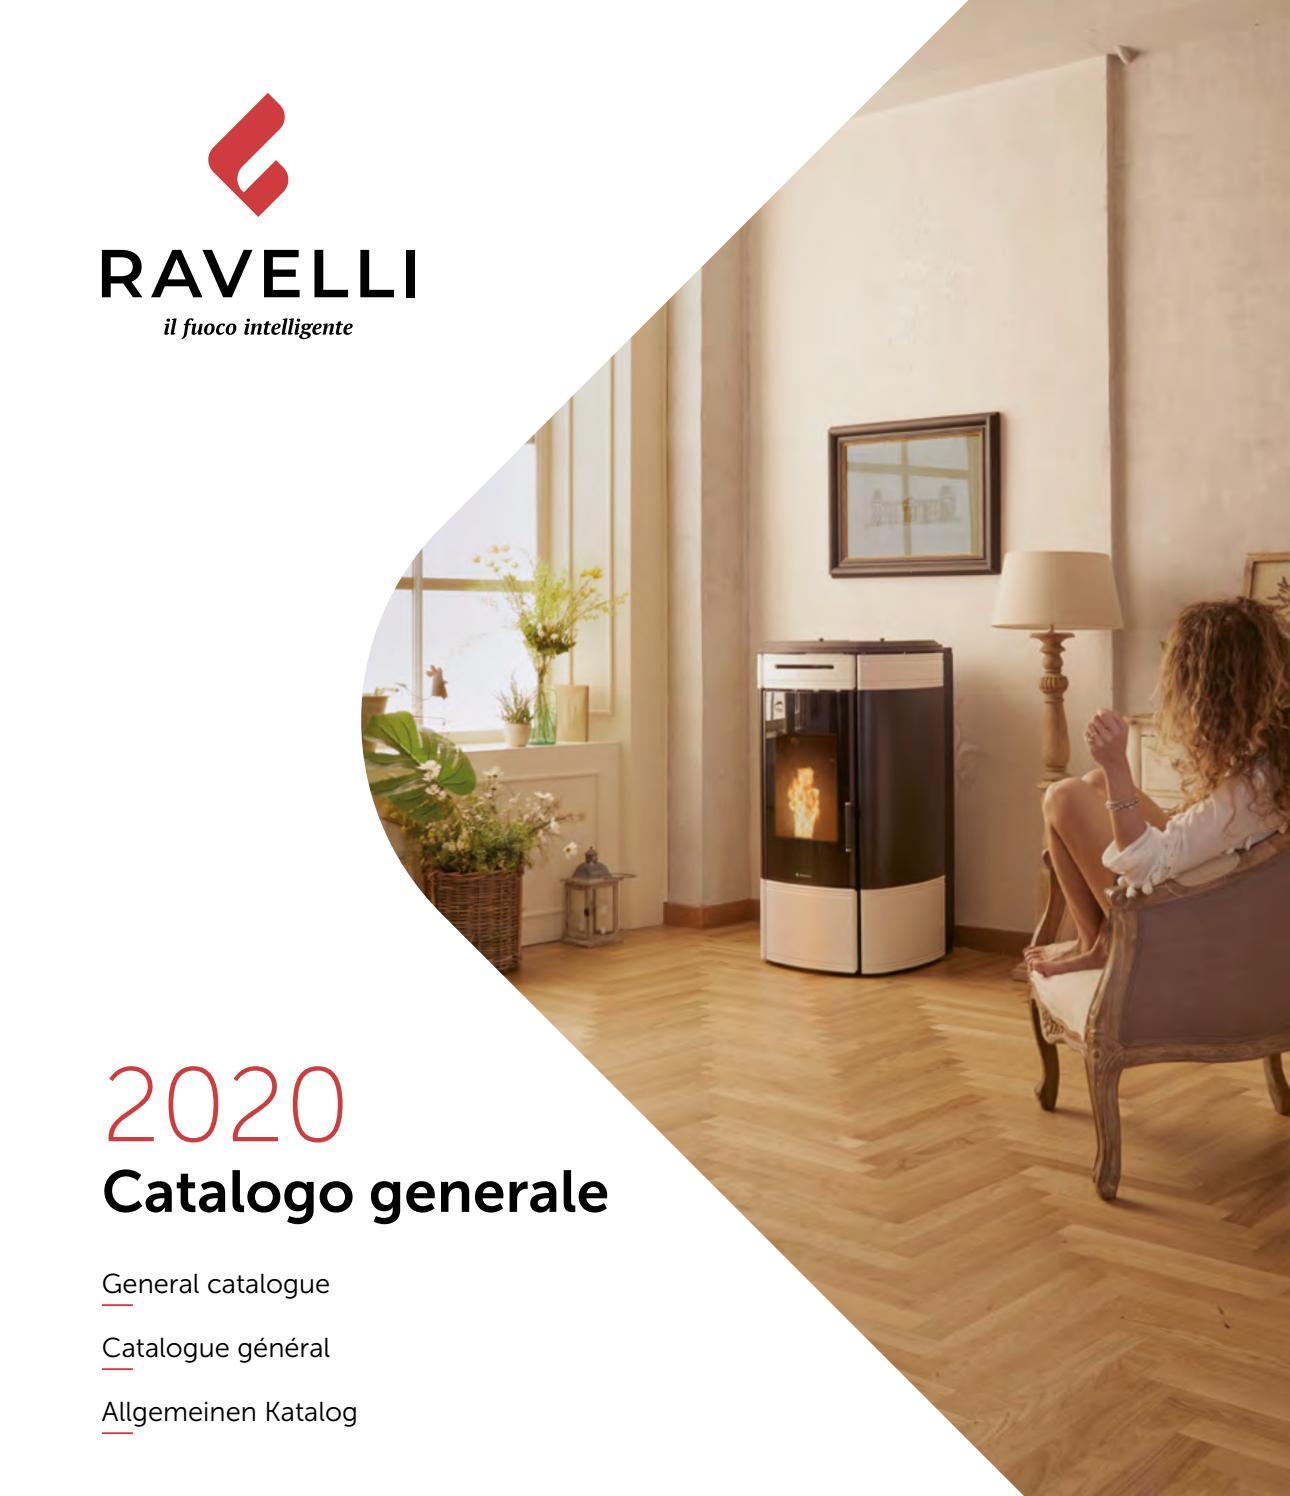 Ravelli - Catalogo Generale 2020 by Idea Caminetti - issuu